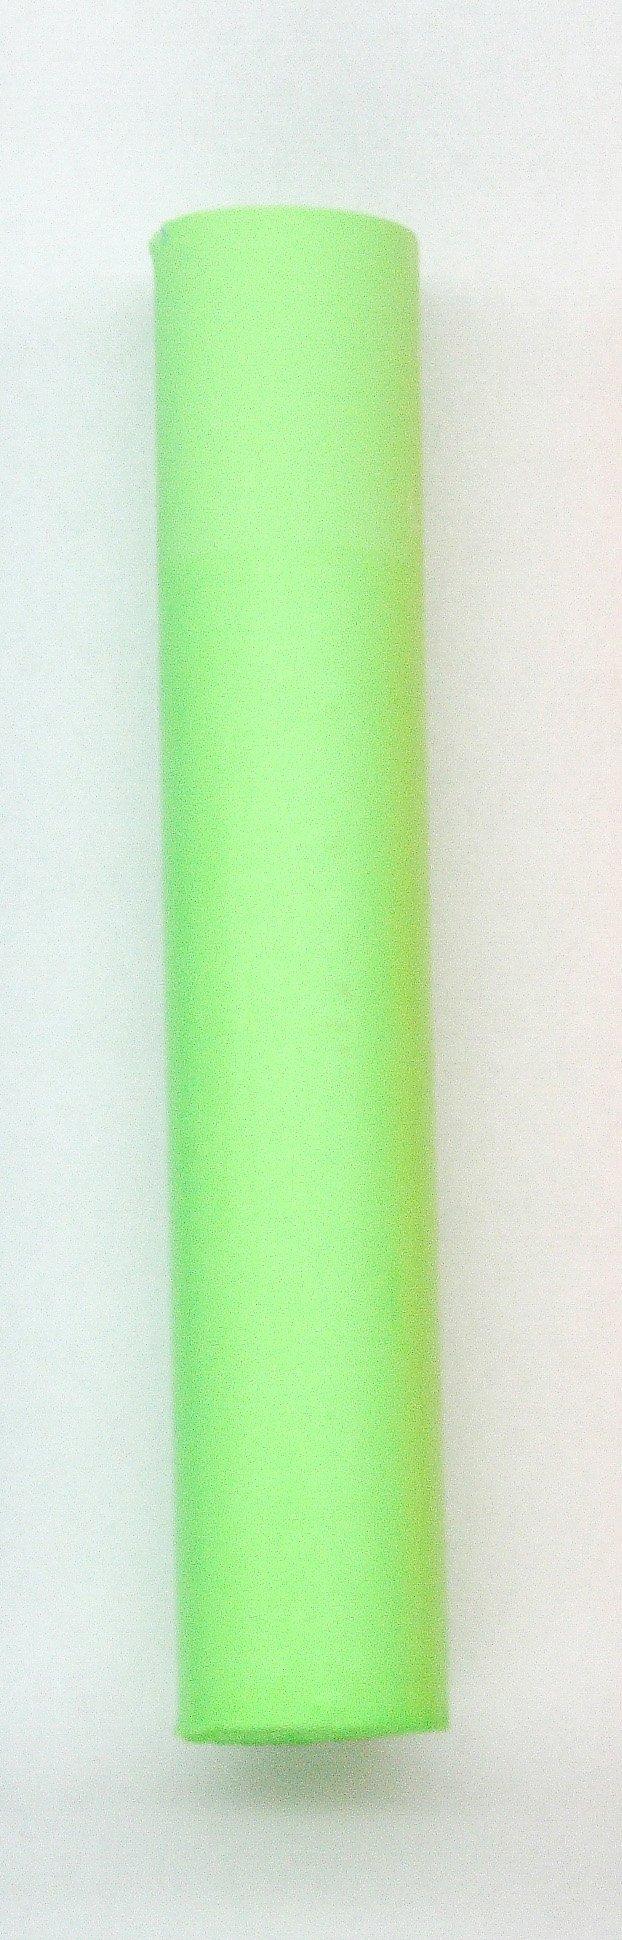 Japan physics and chemistry Dasutoresu fluorescent chalk green DCK-72-G 72 pi... by Dustless (Image #2)